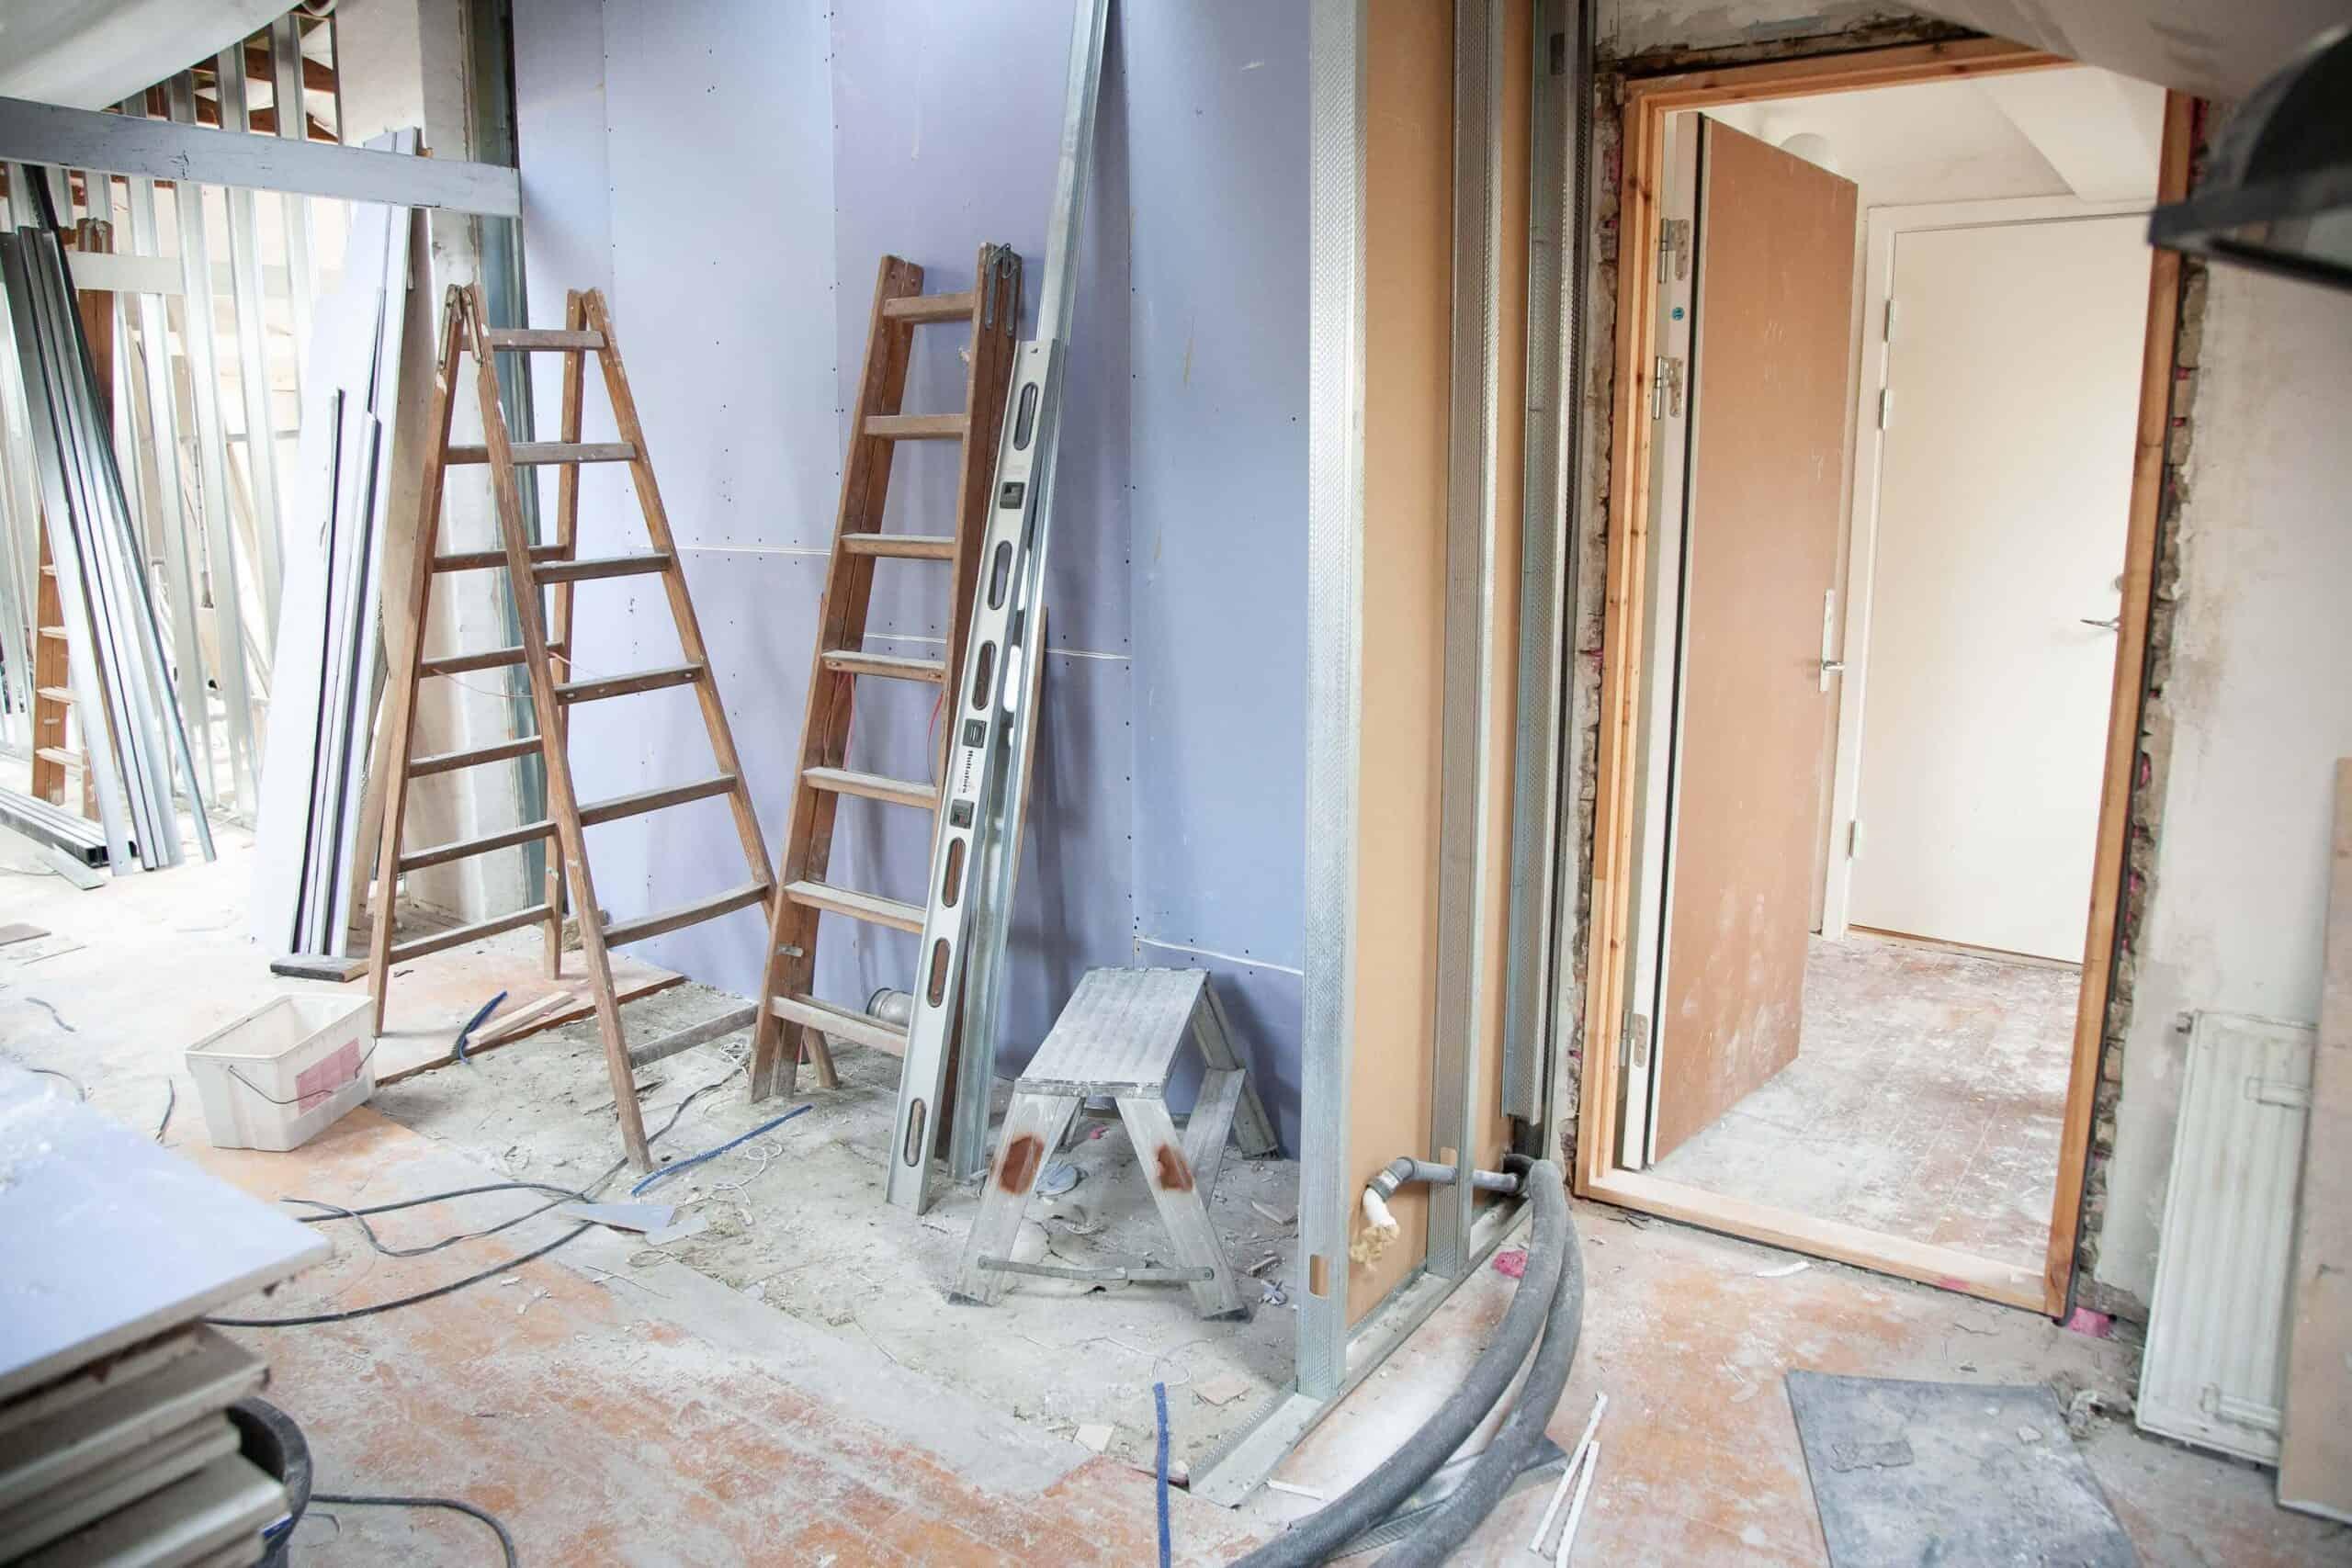 hiring a professional construction team